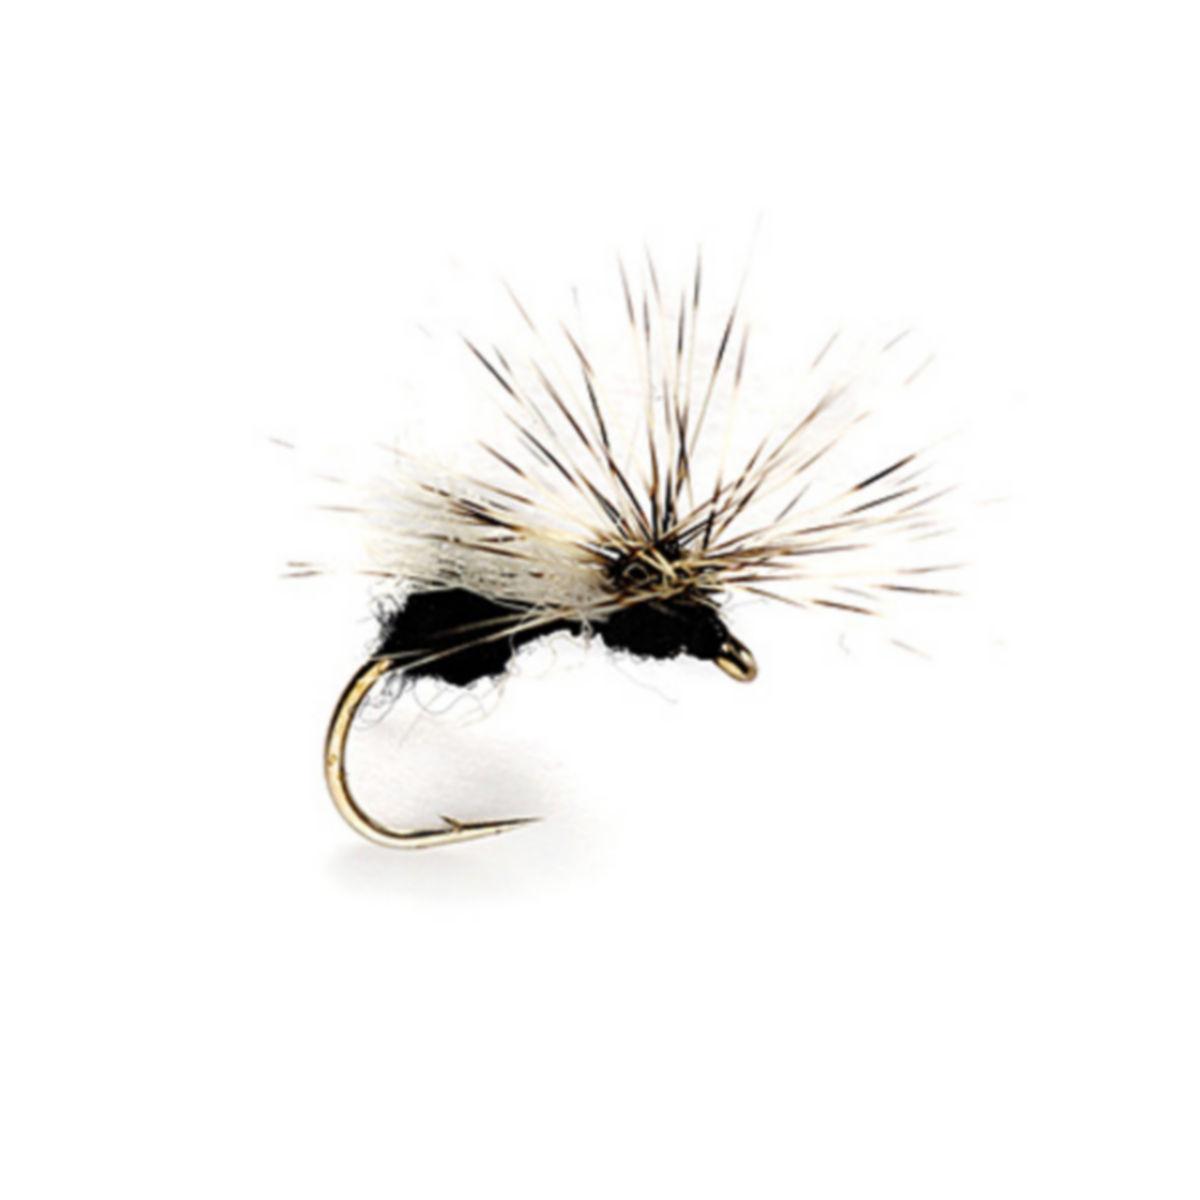 Splitsville Flying Ant - image number 0